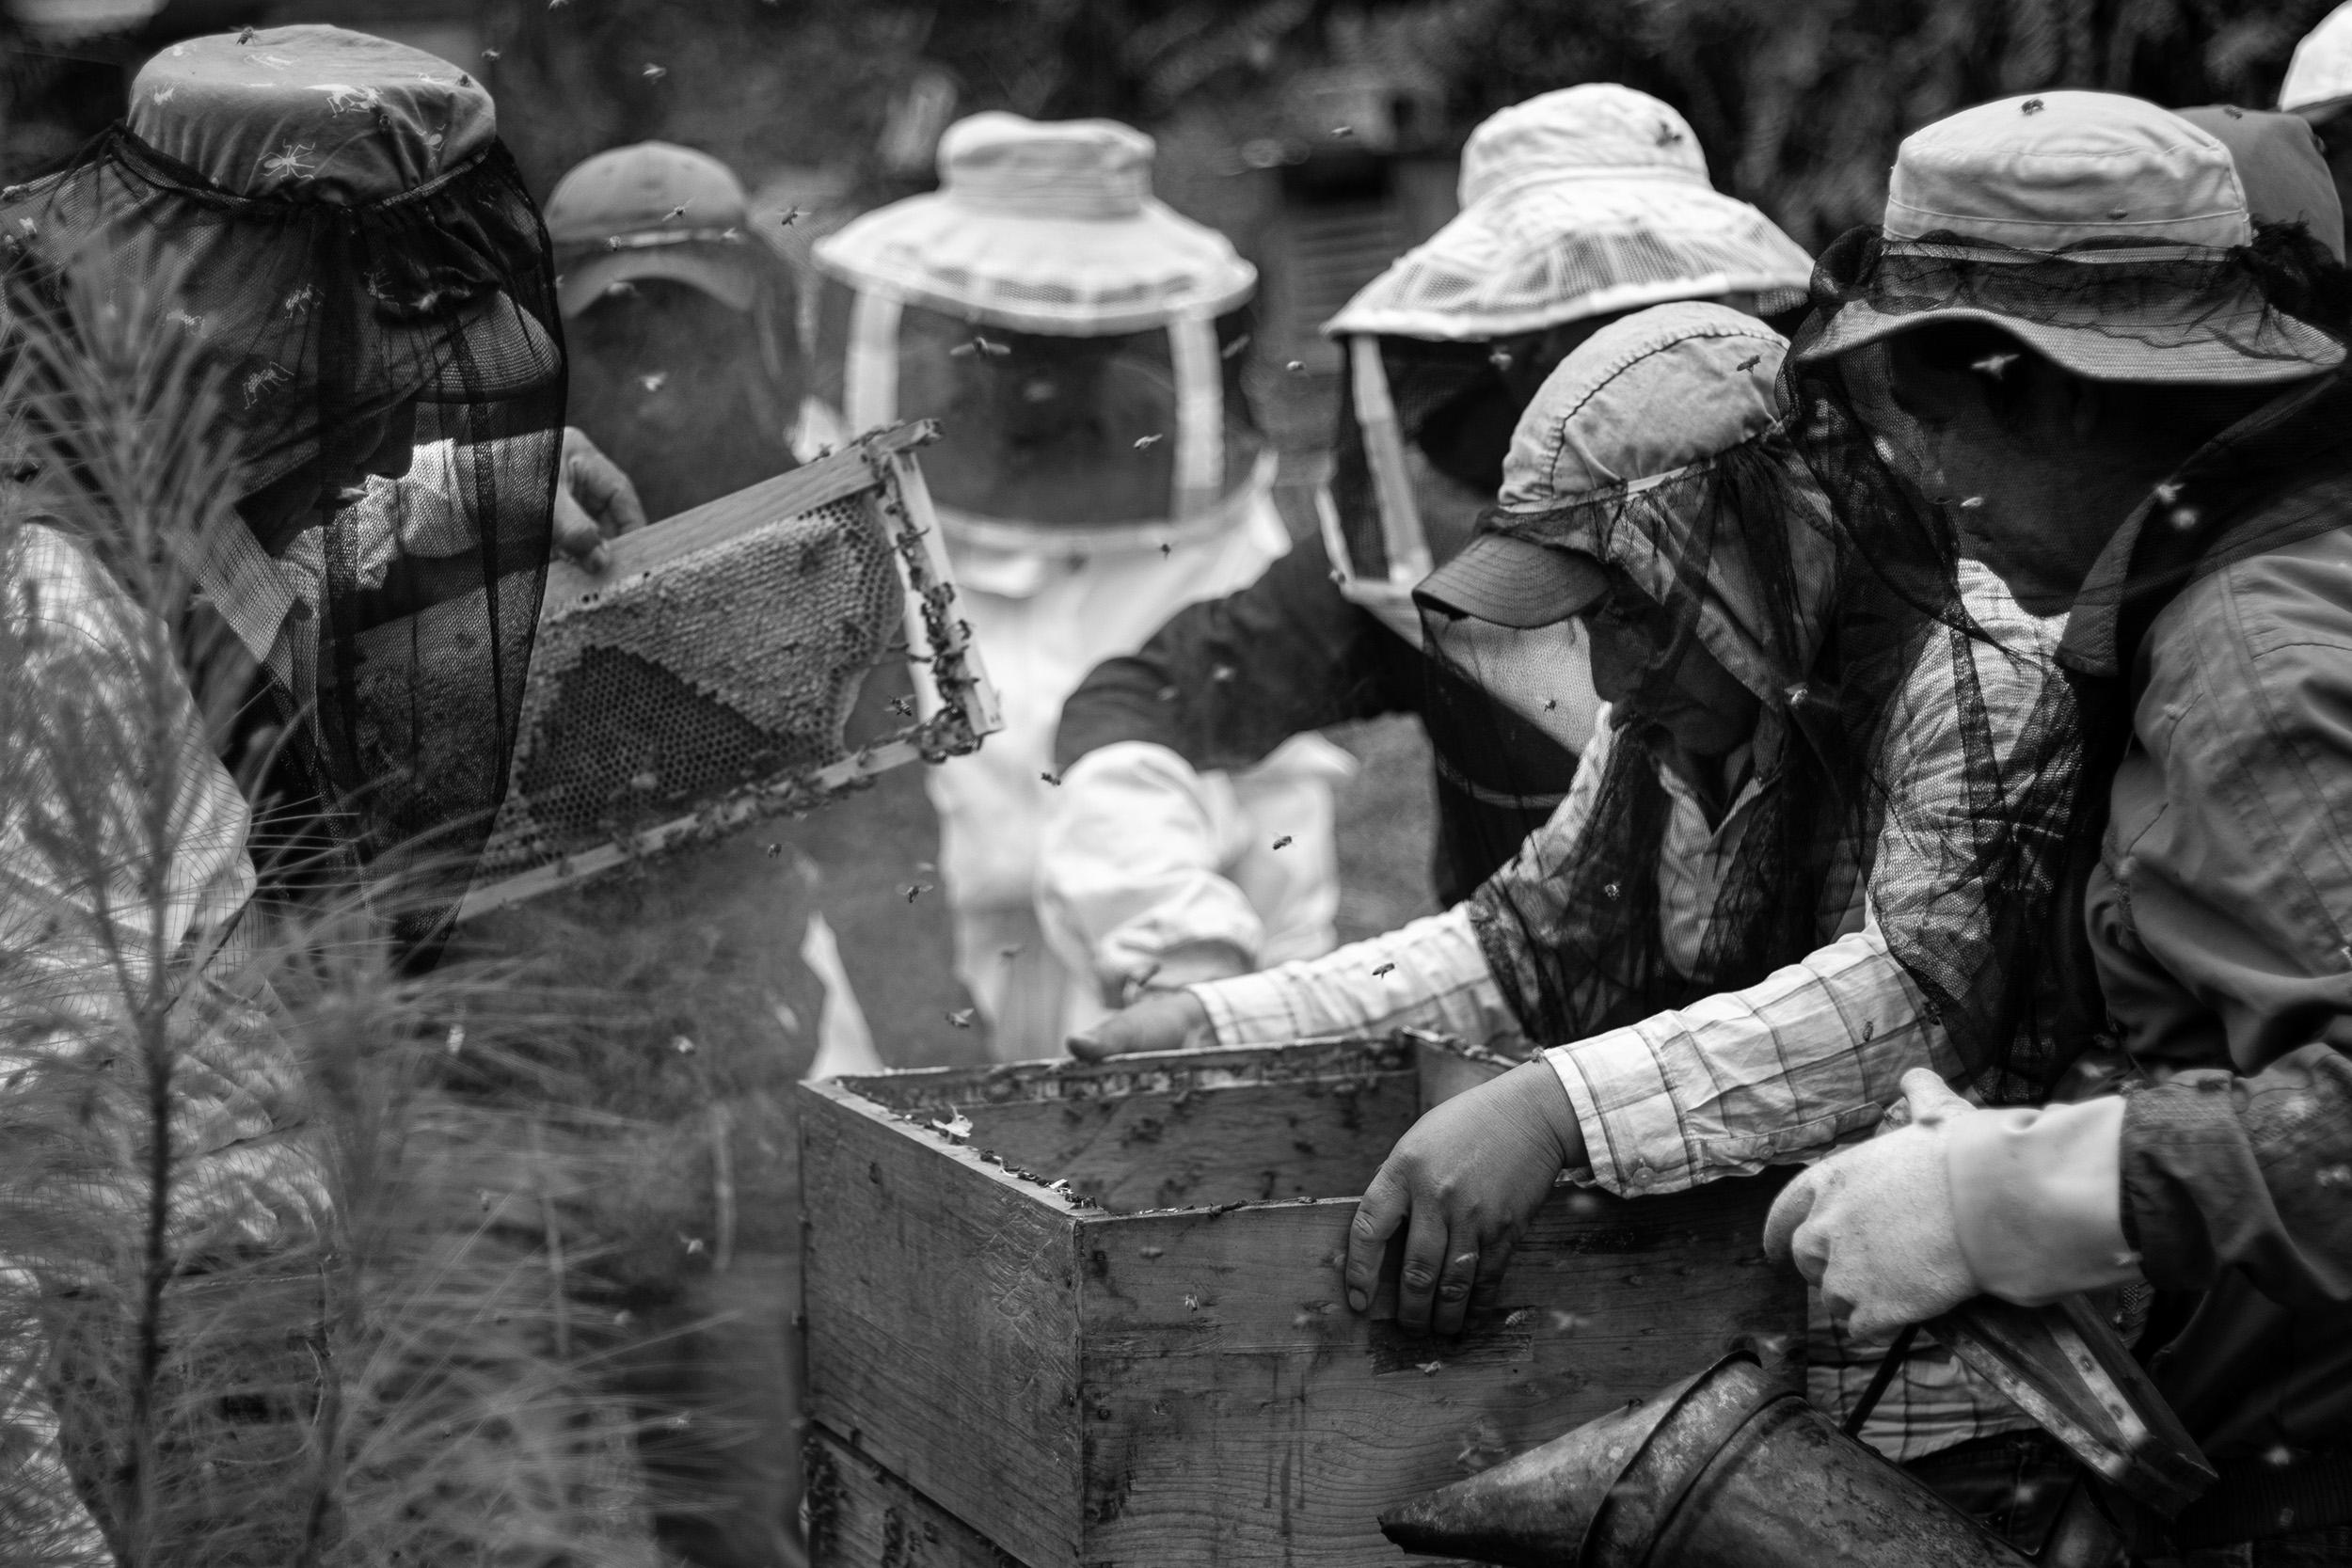 A beekeeping training in full swing.